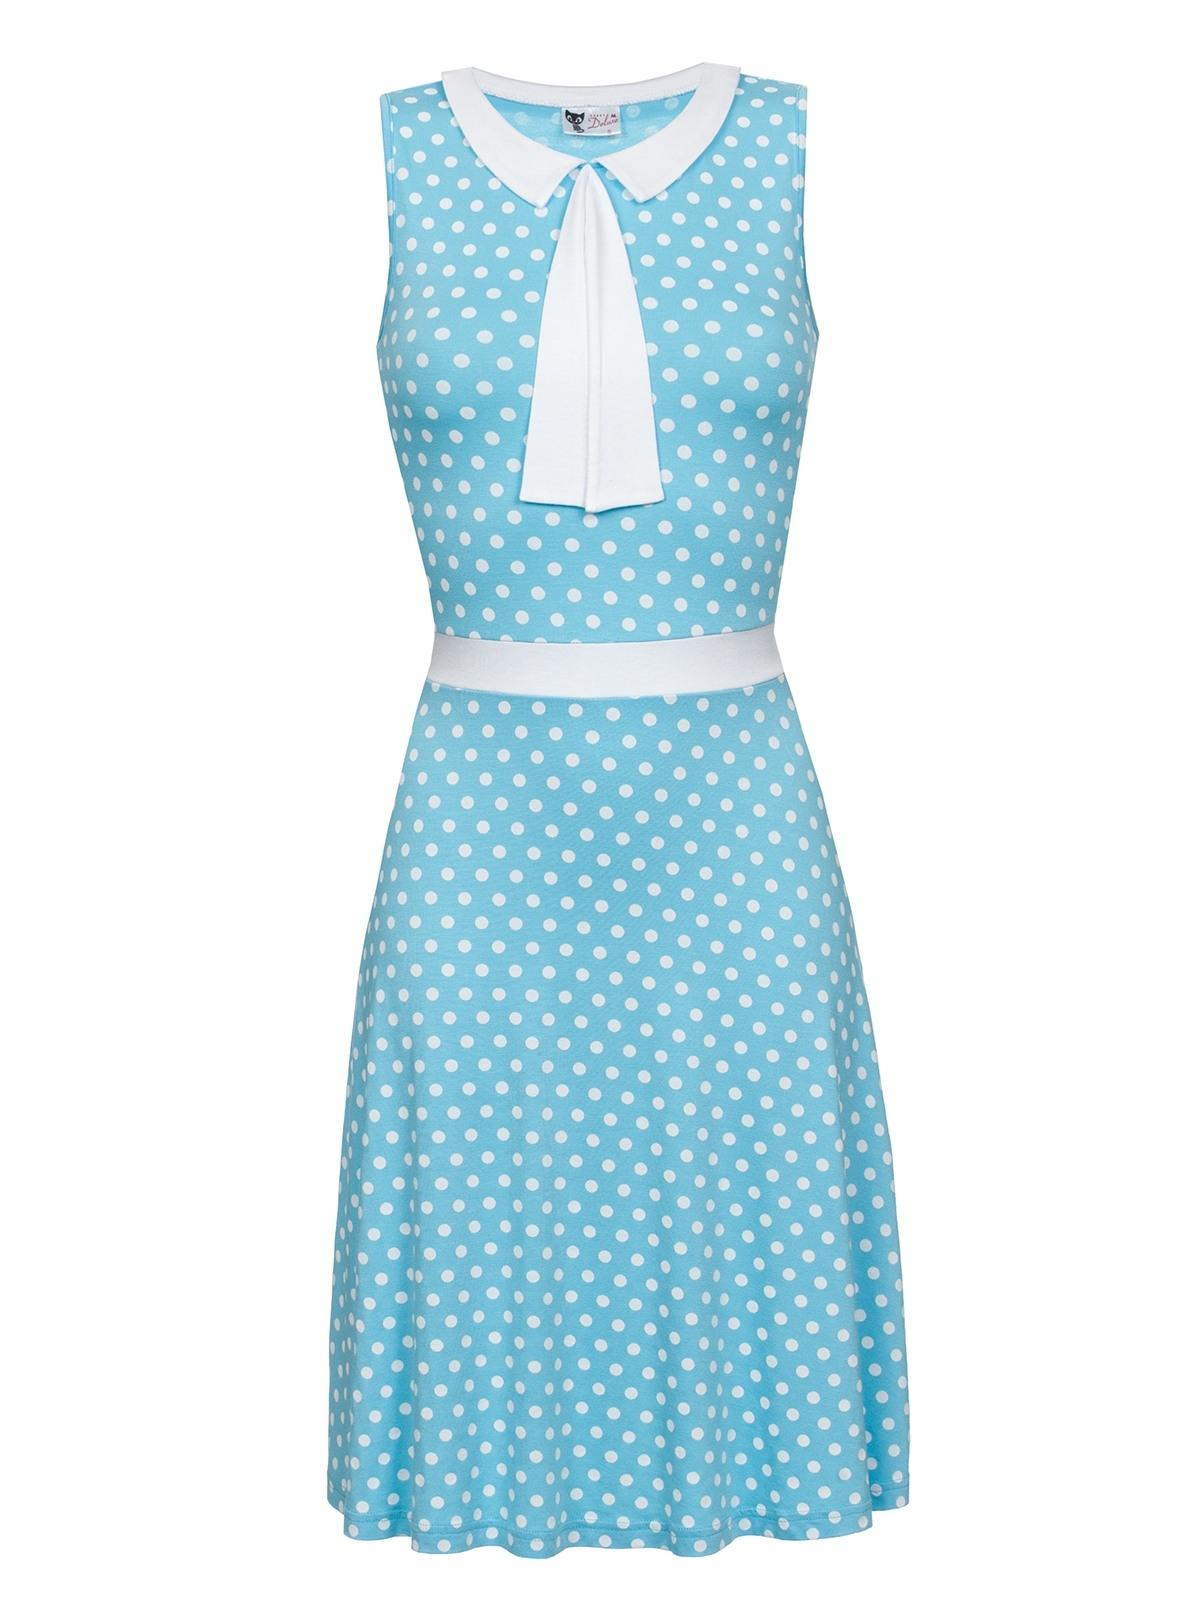 17 Schön Kleid Hellblau für 201913 Genial Kleid Hellblau Ärmel